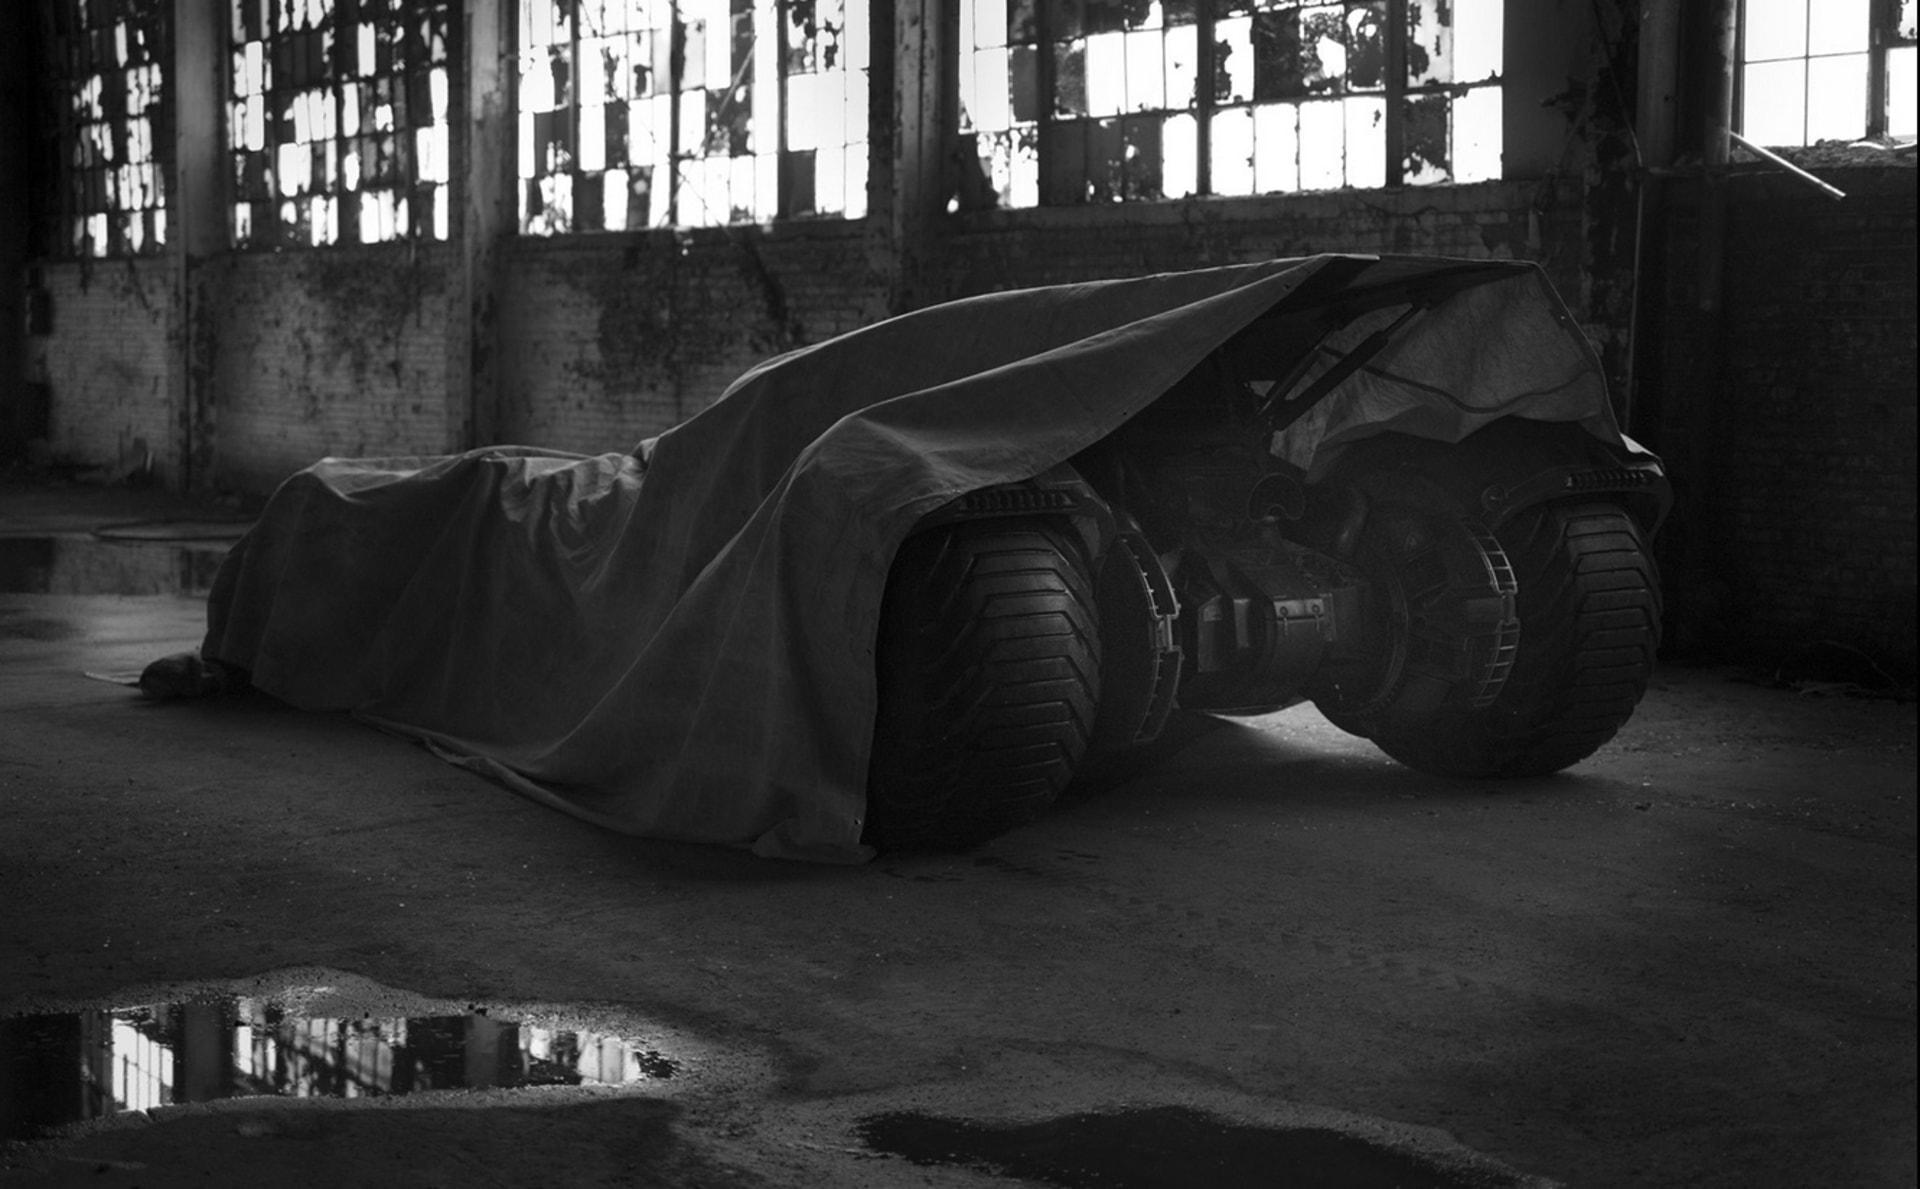 Batmobile in black and white